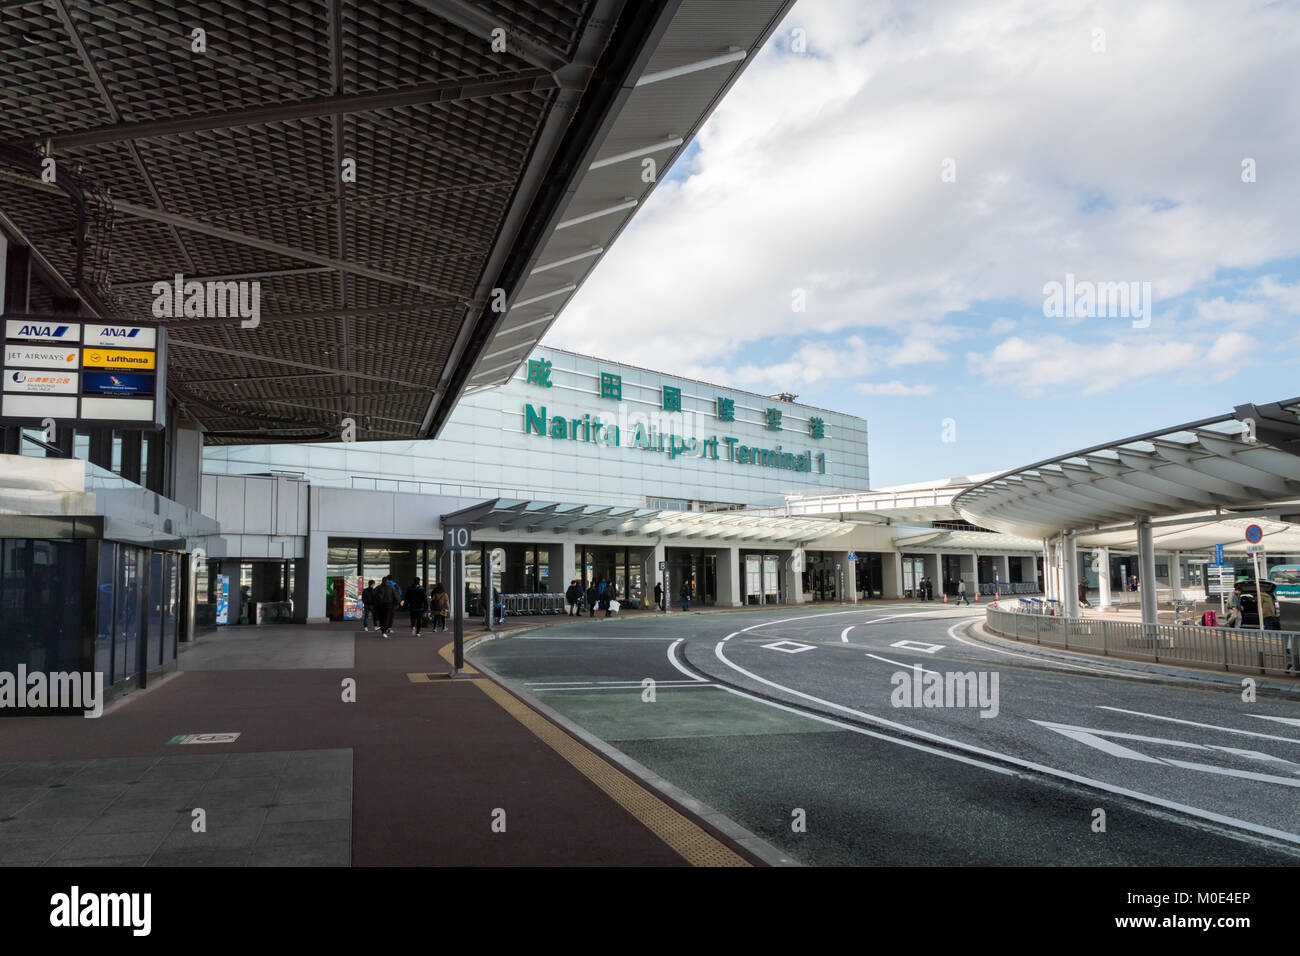 Tokyo, Japan - November 2017: Terminal 1 building of Narita International Airport, Tokyo, Japan. Narita Airport - Stock Image